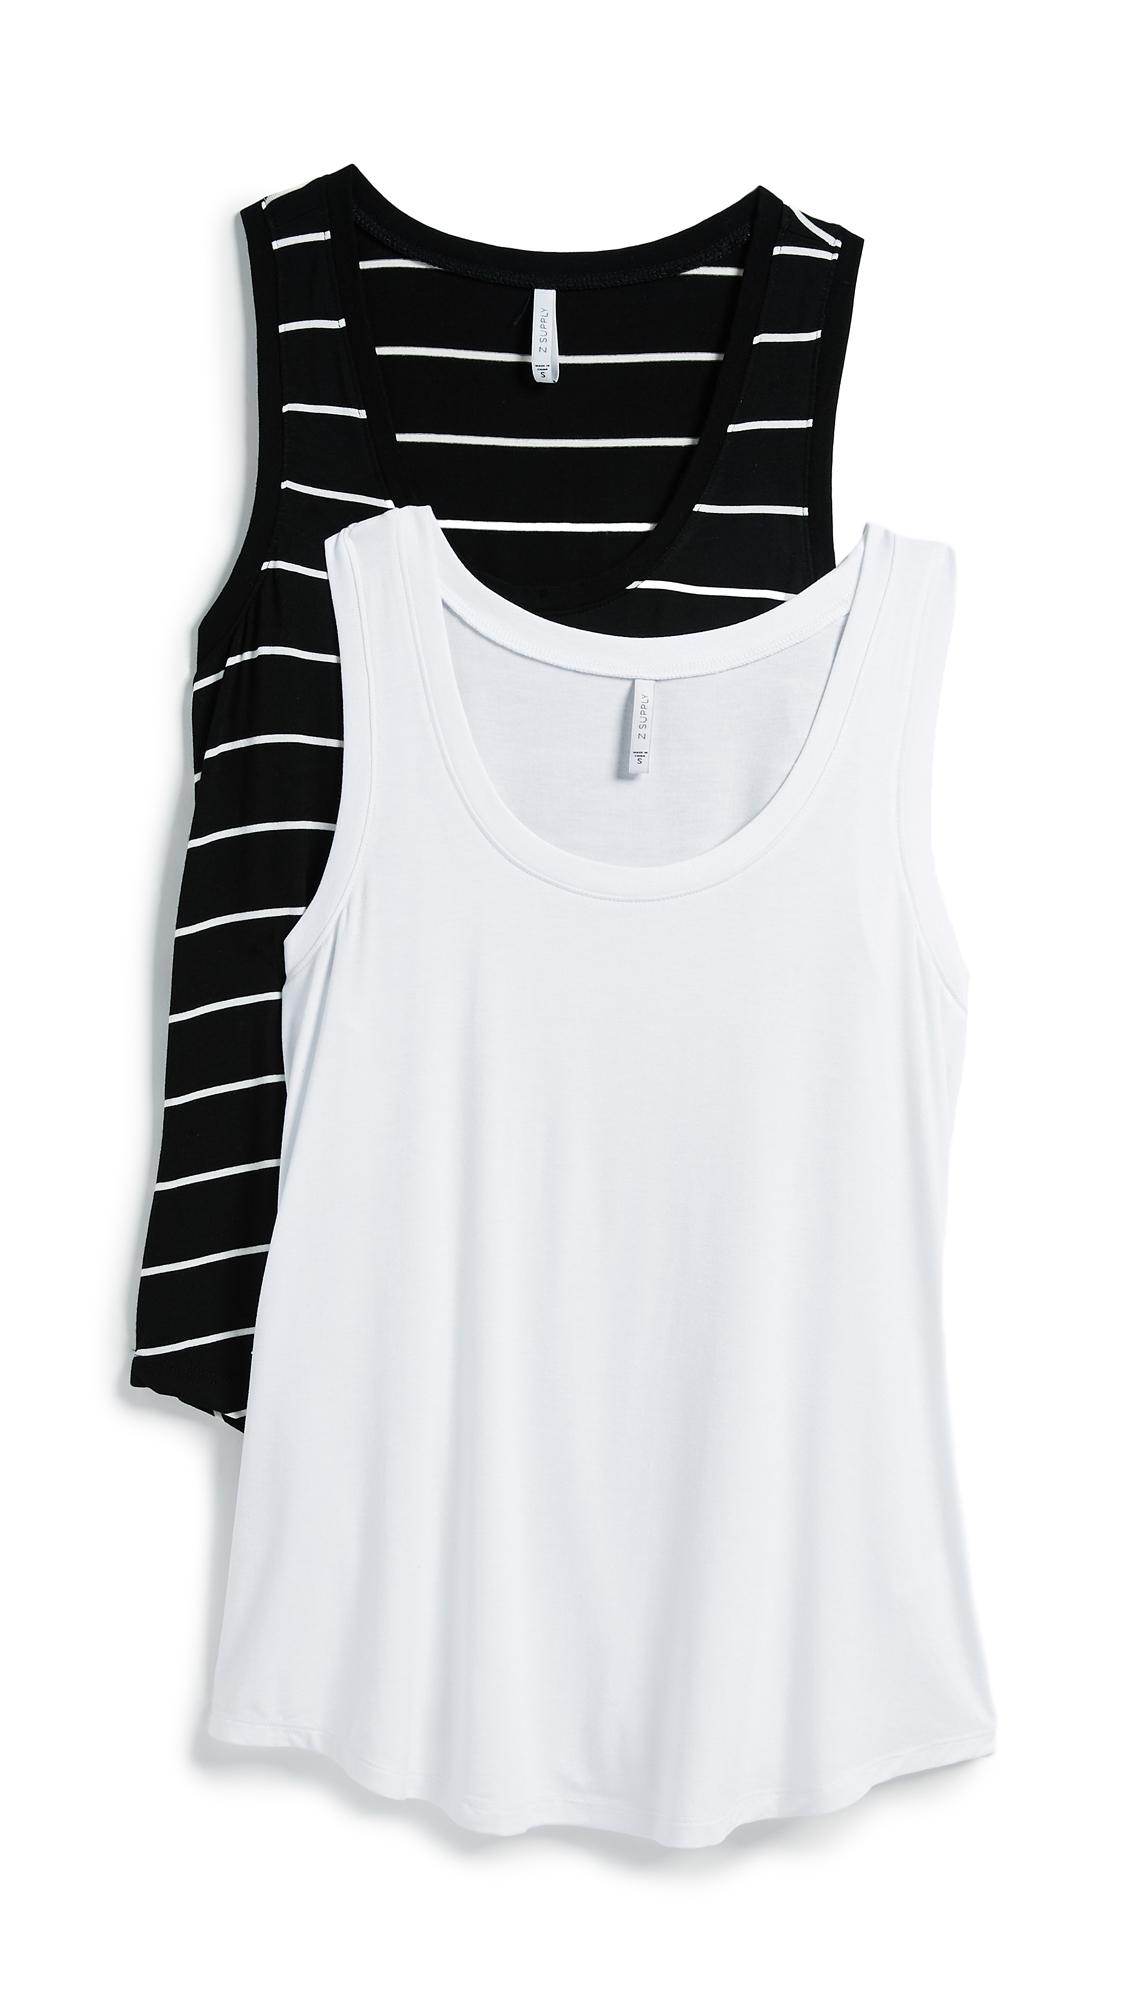 Z Supply The Sleek & Stripe Tank 2 Pack In White/Black